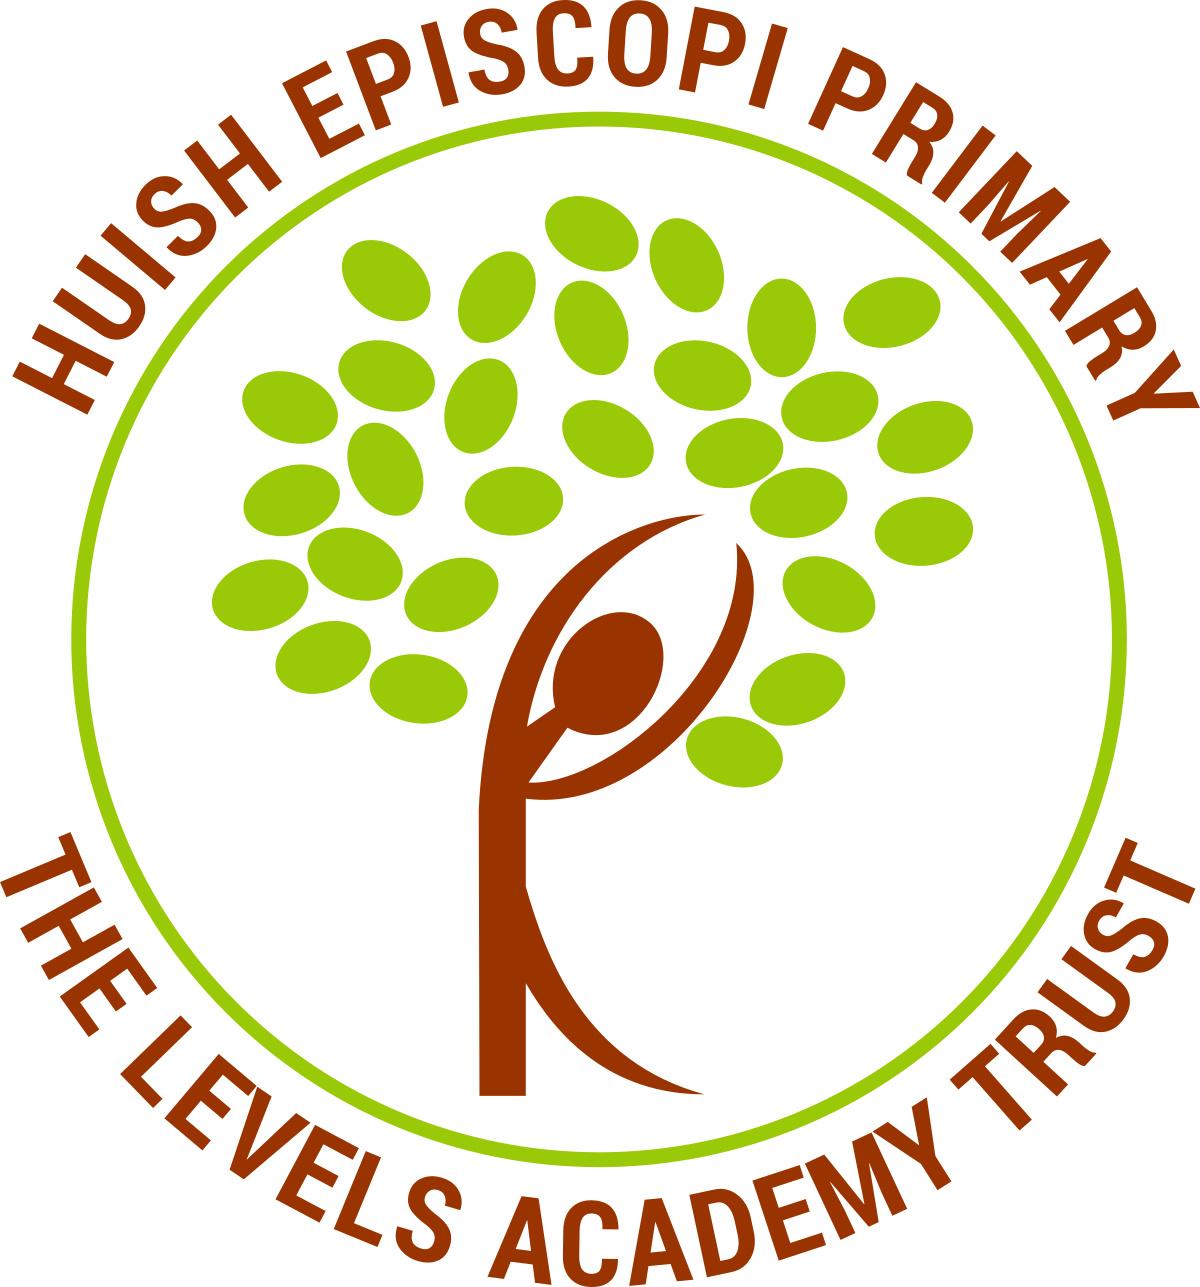 Huish Episcopi Primary School